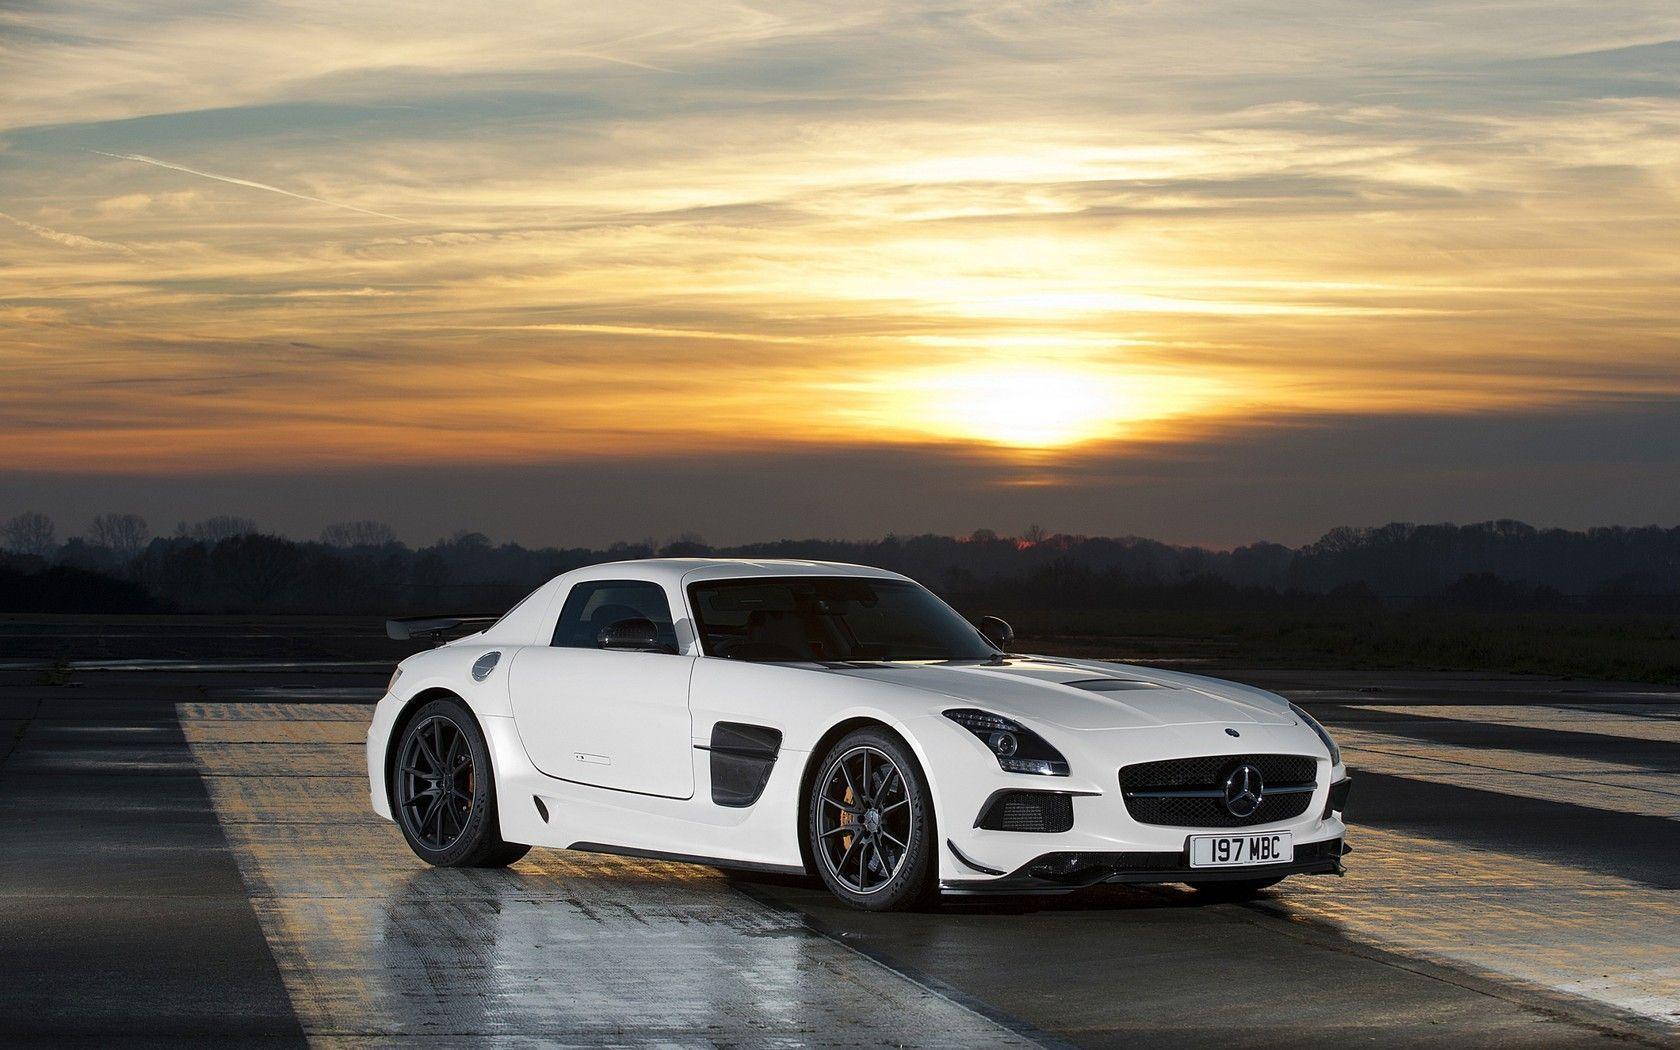 Mercedes Benz SLS AMG BLACK SERIES photoshoot!!! * What is